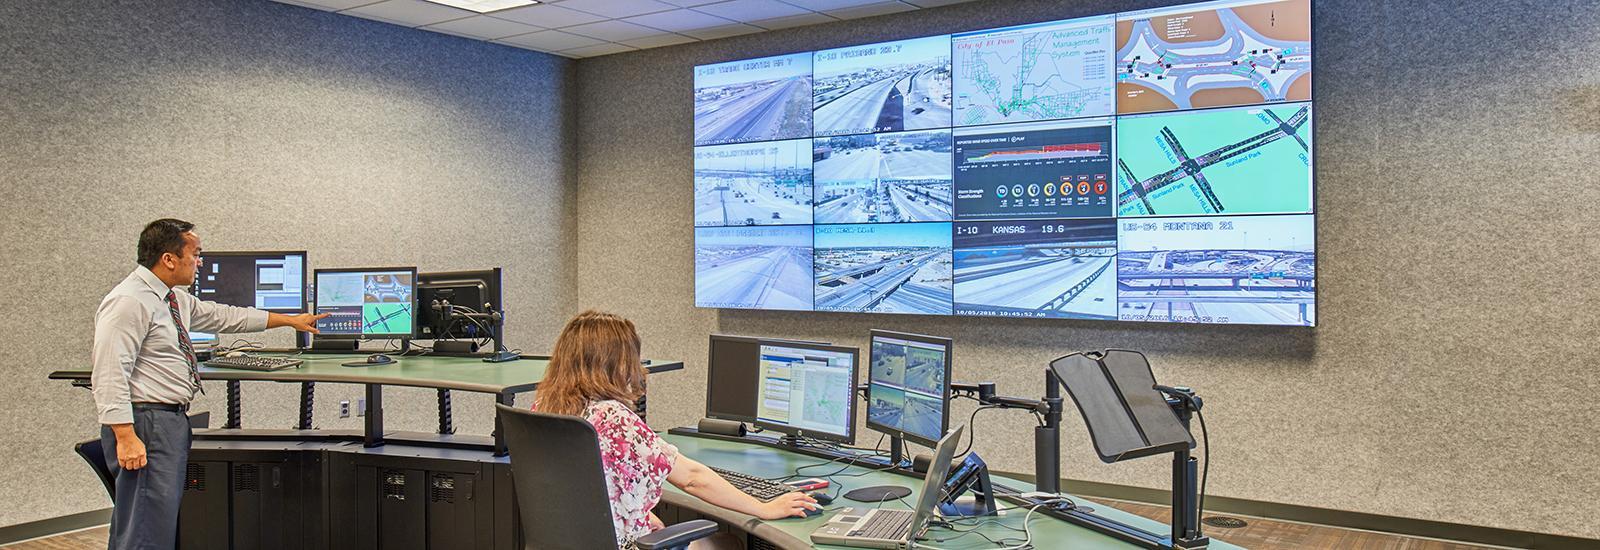 City of El Paso Traffic Management Center Relocation